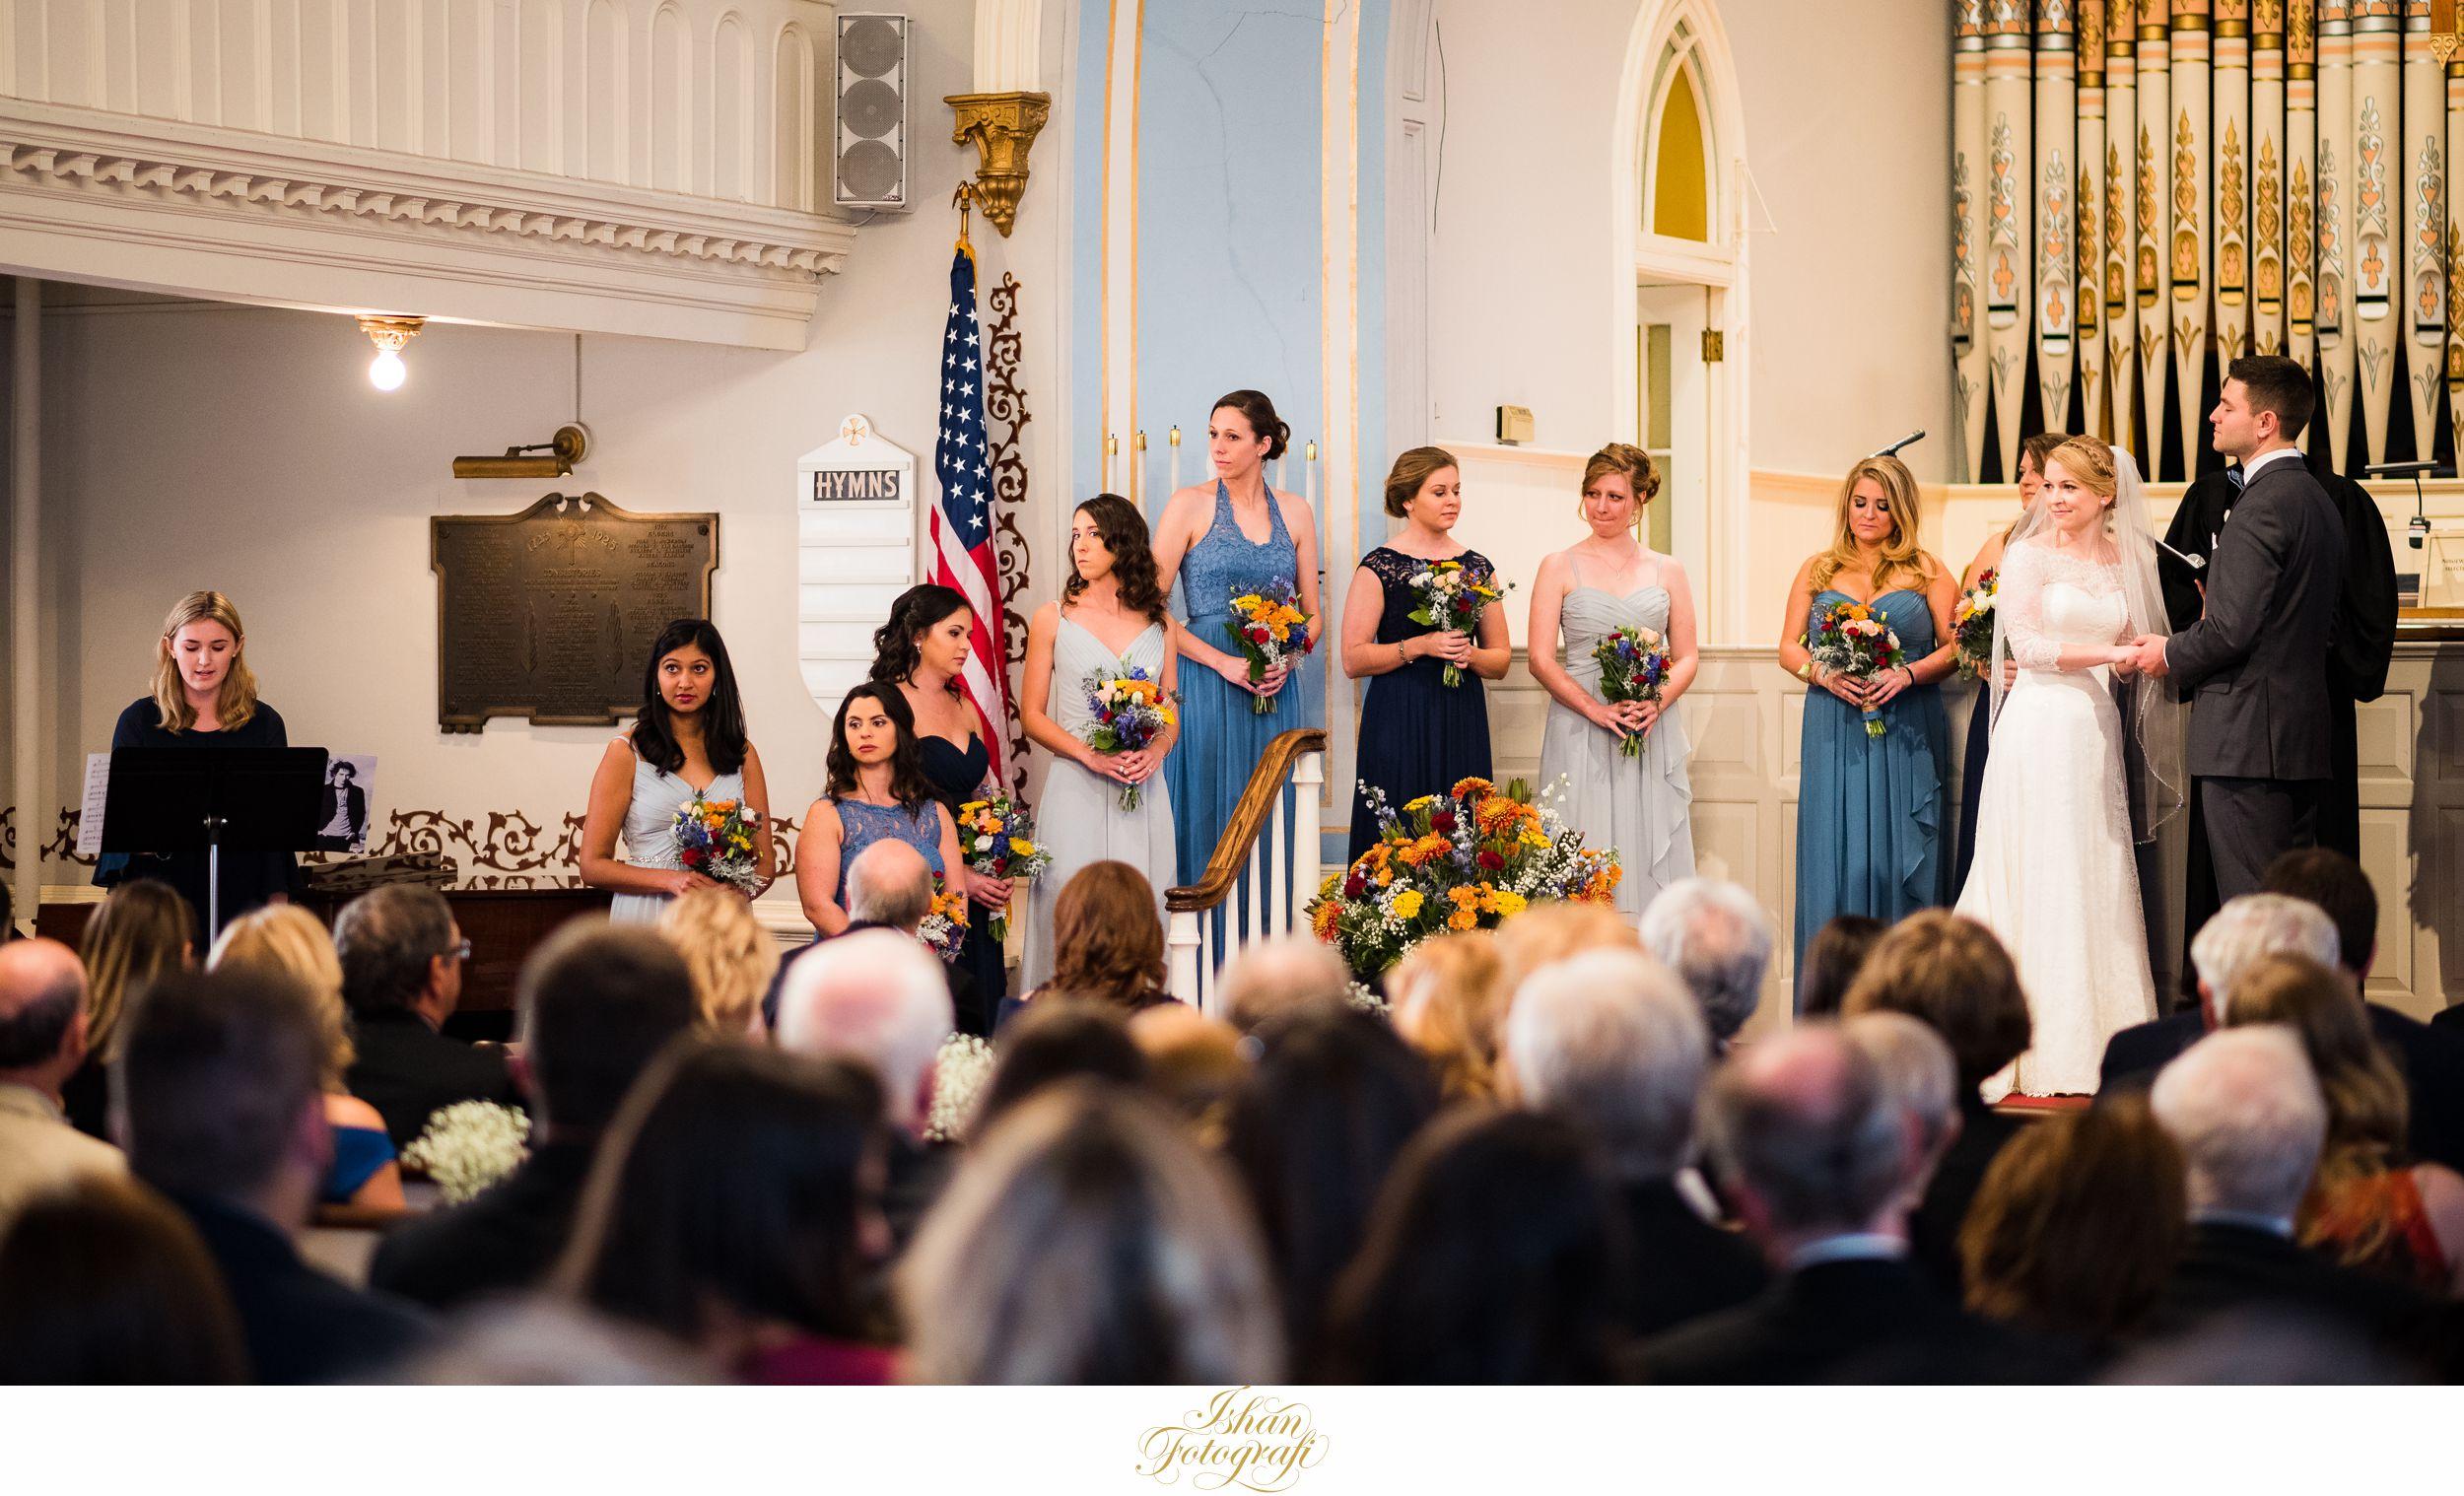 old-paramus-reformed-church-wedding-ceremony